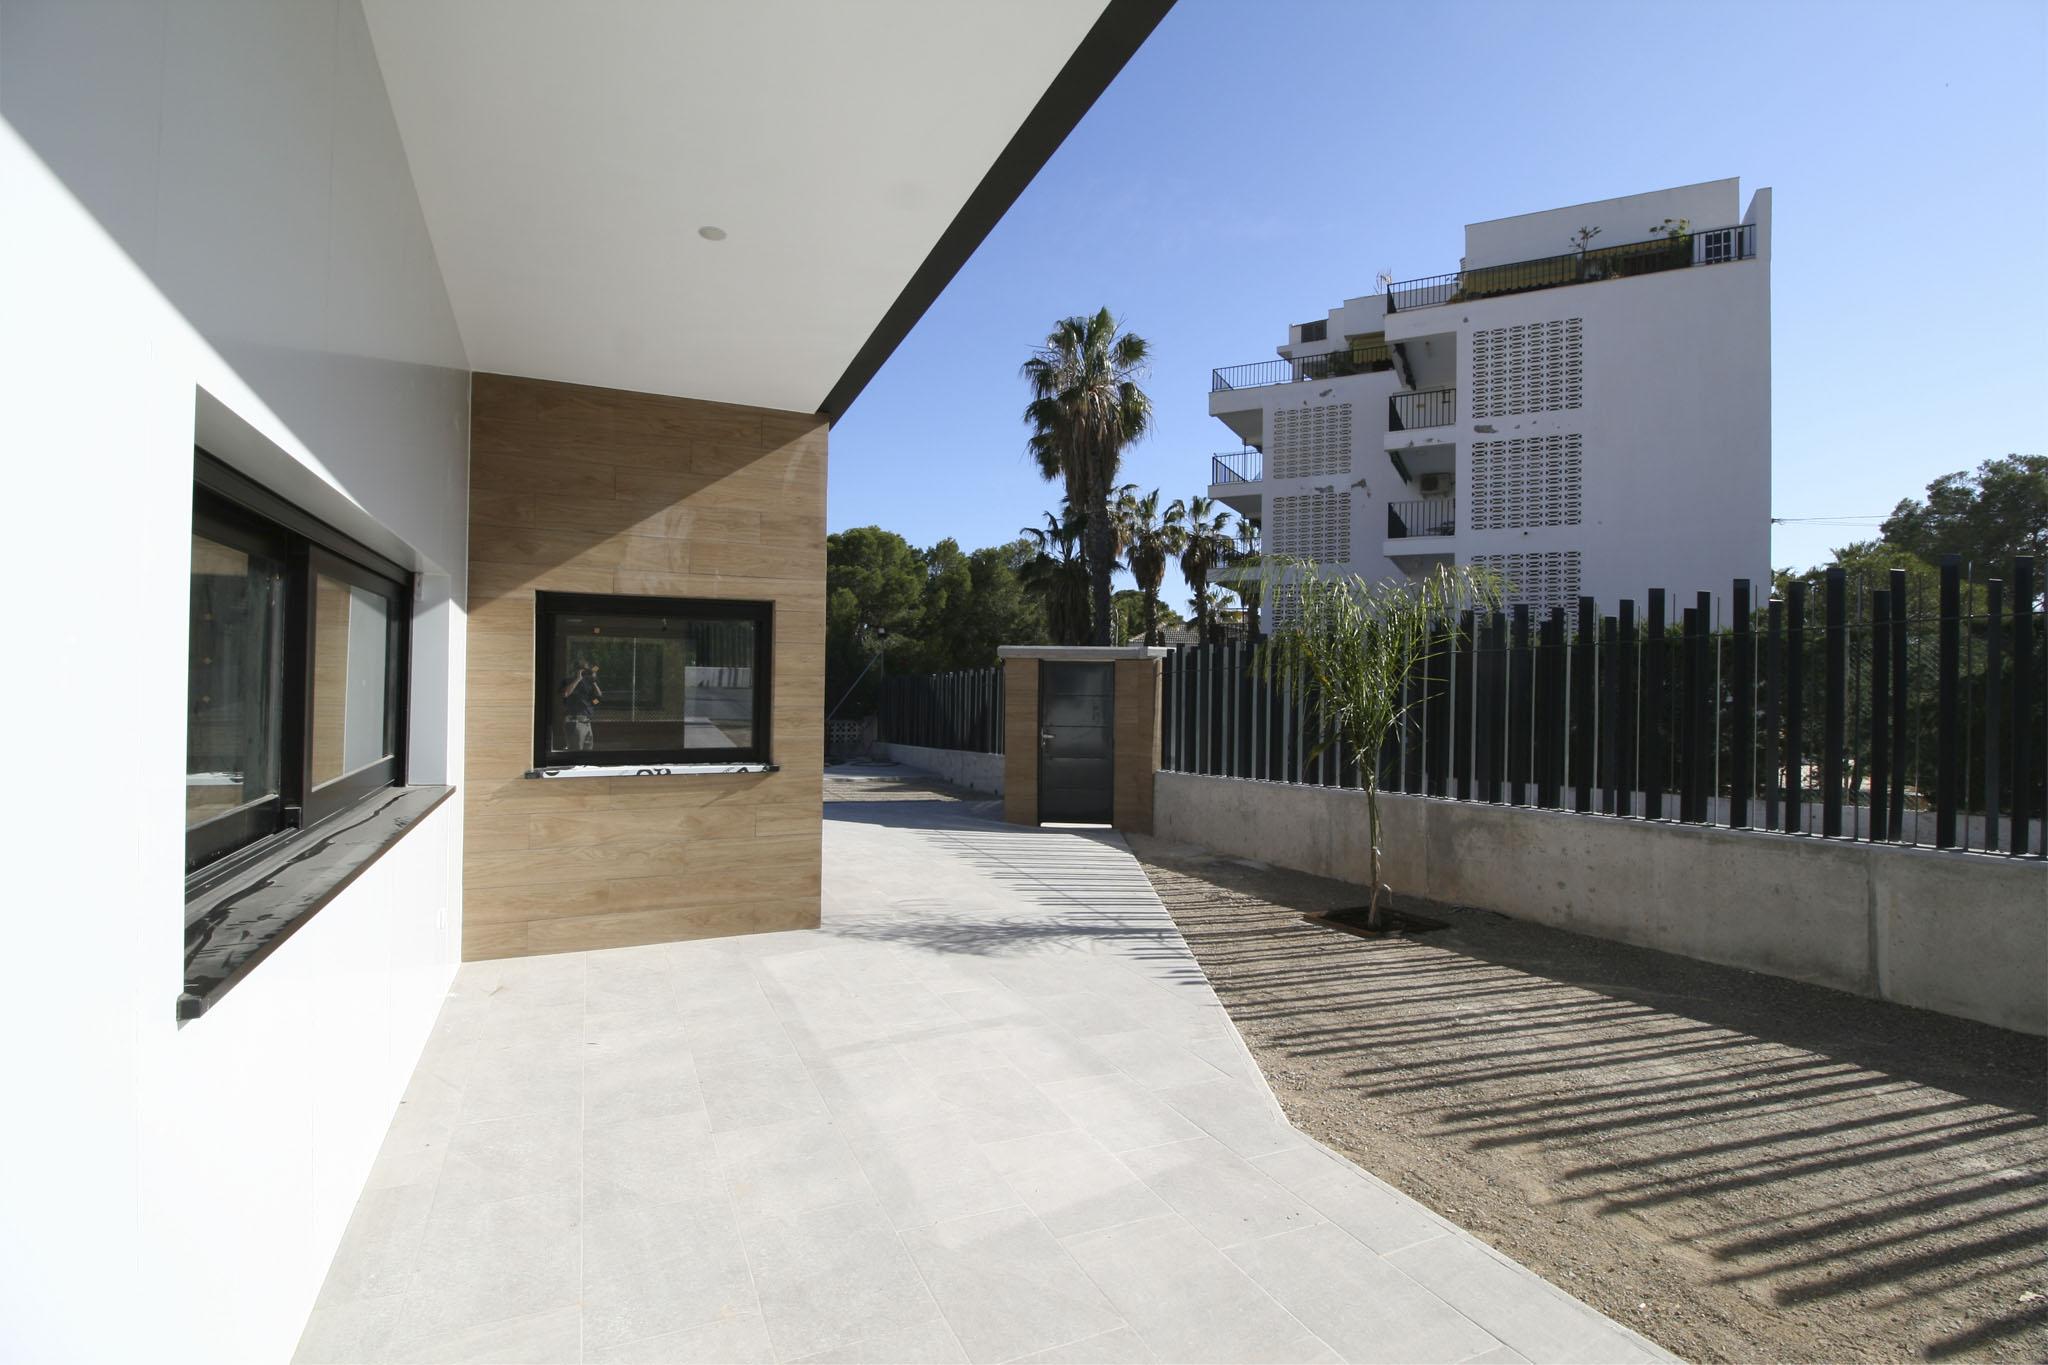 vivienda-fachada-madera